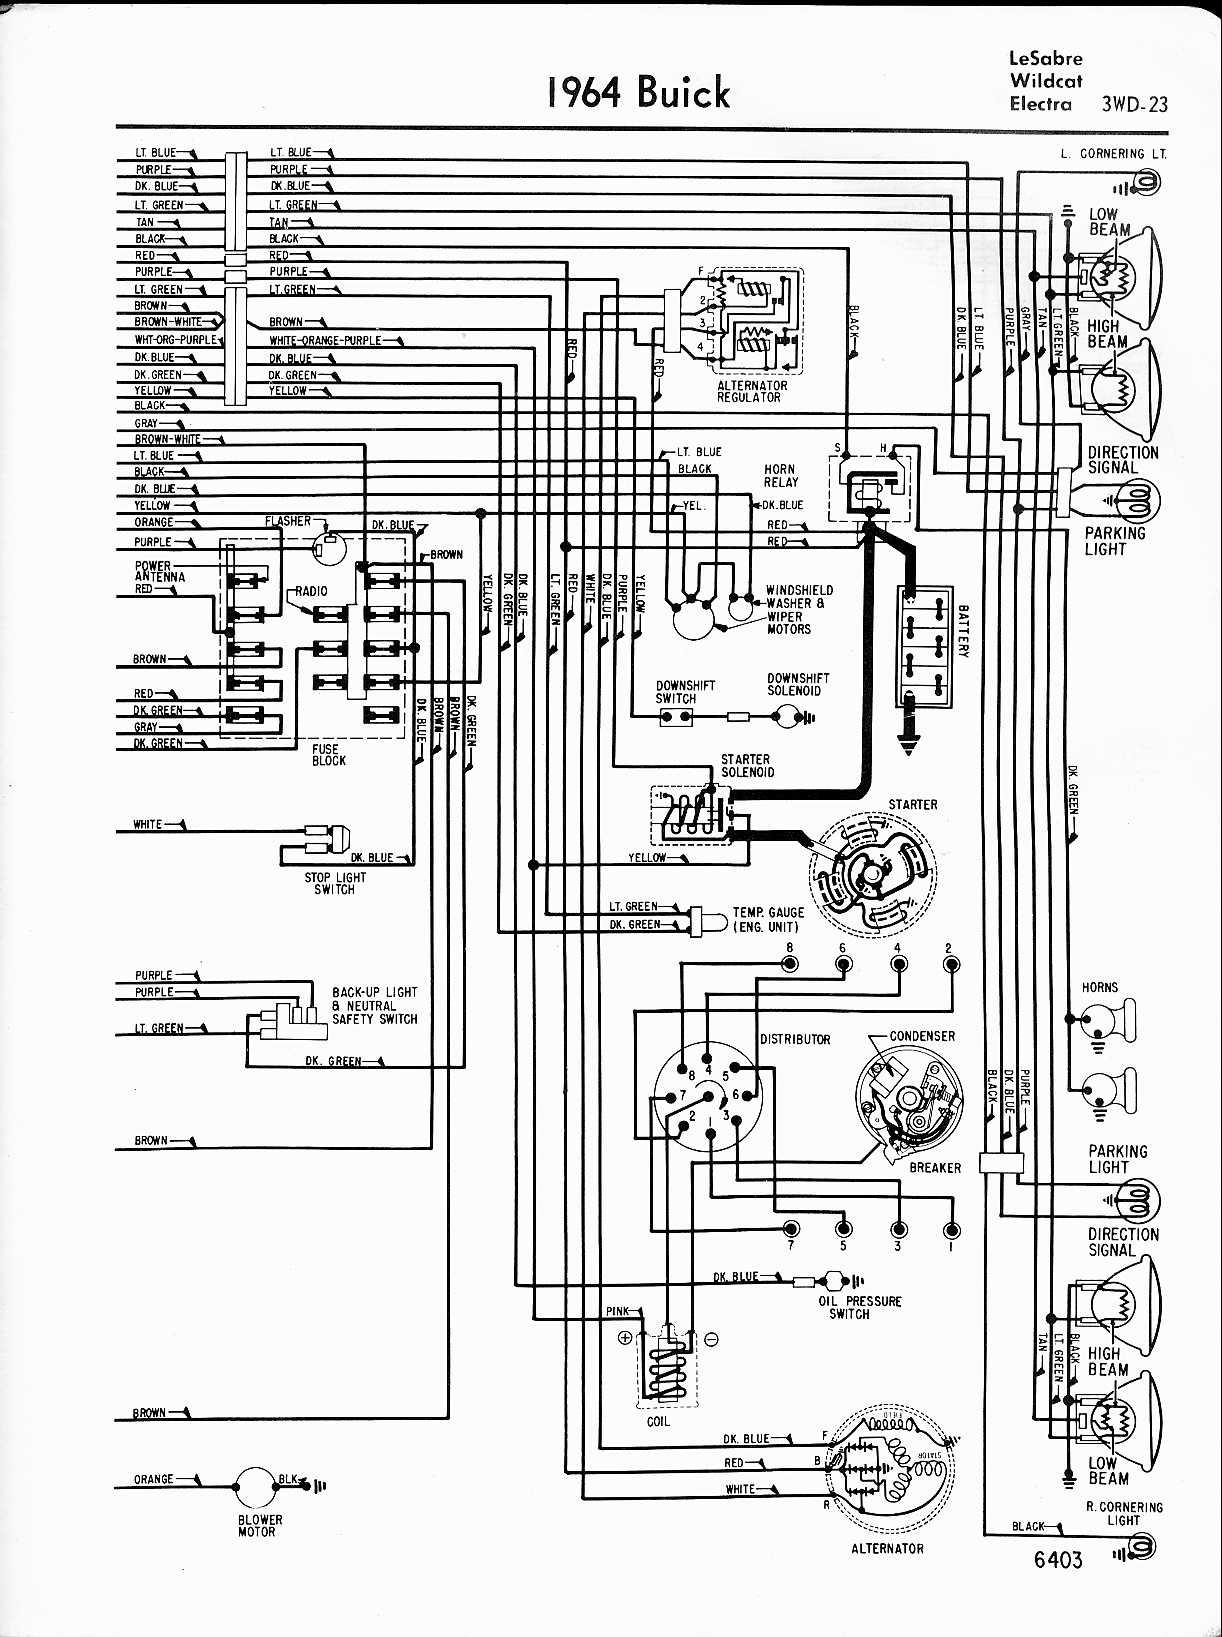 1984 buick wiring diagrams